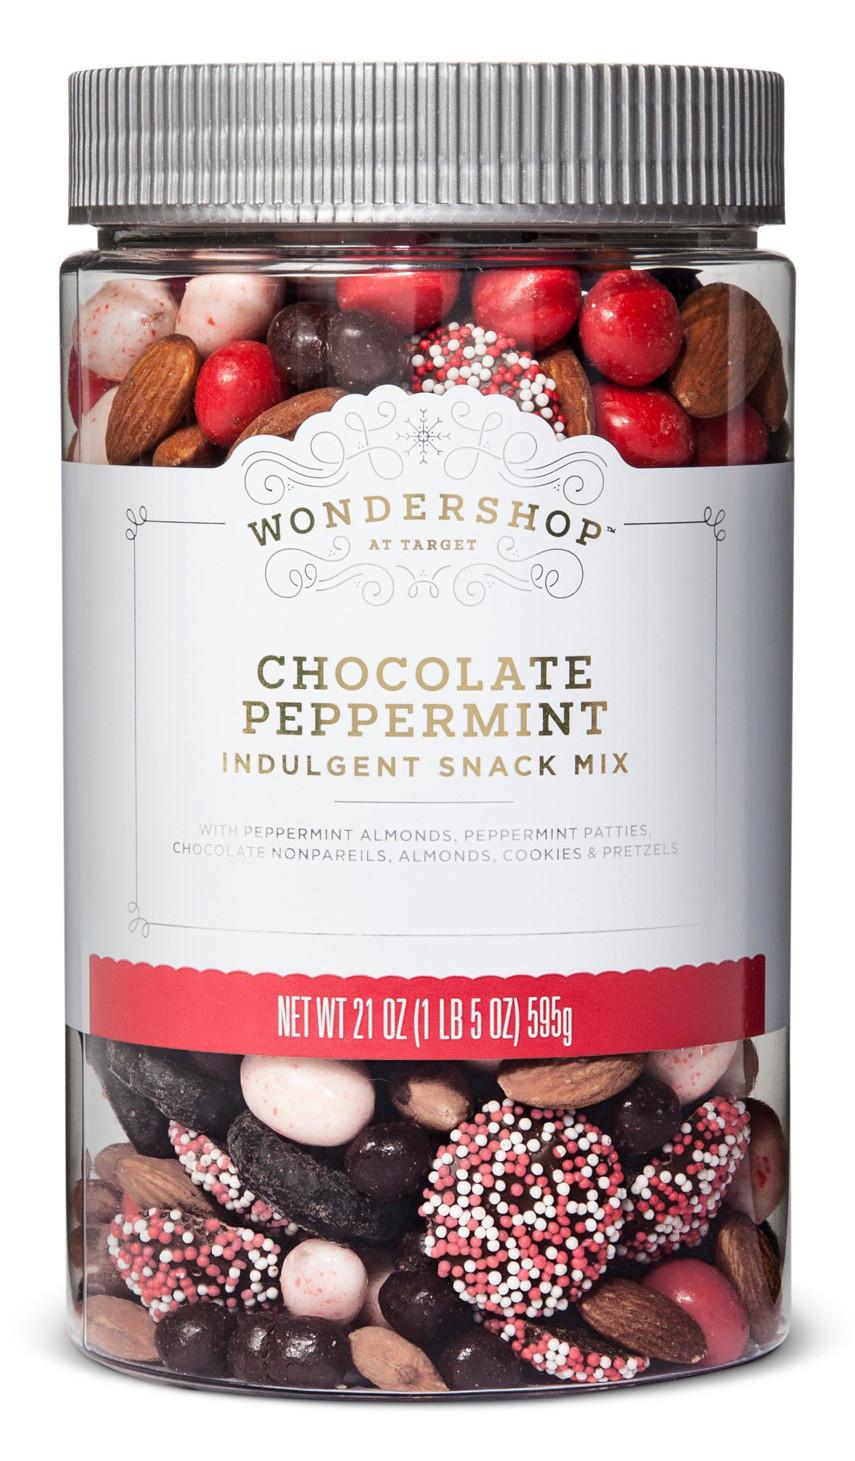 Wondershop™ Chocolate Peppermint Indulgent Snack Mix